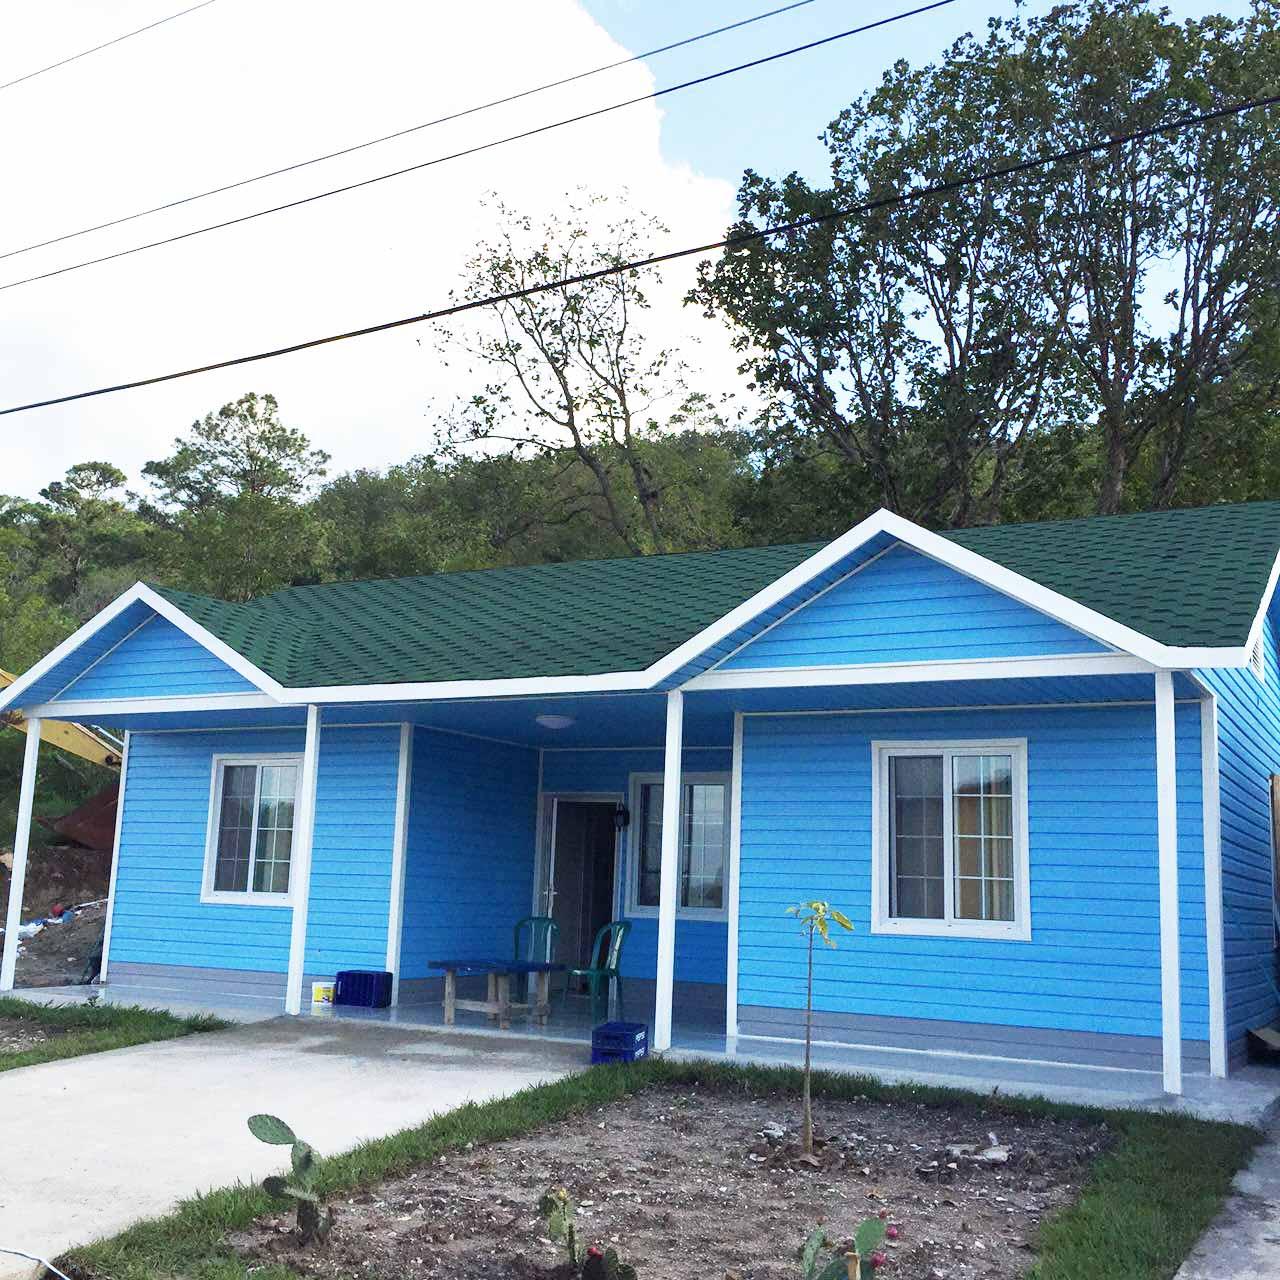 Casa-K Prekit para la Venta |Yahgee (Archispace)